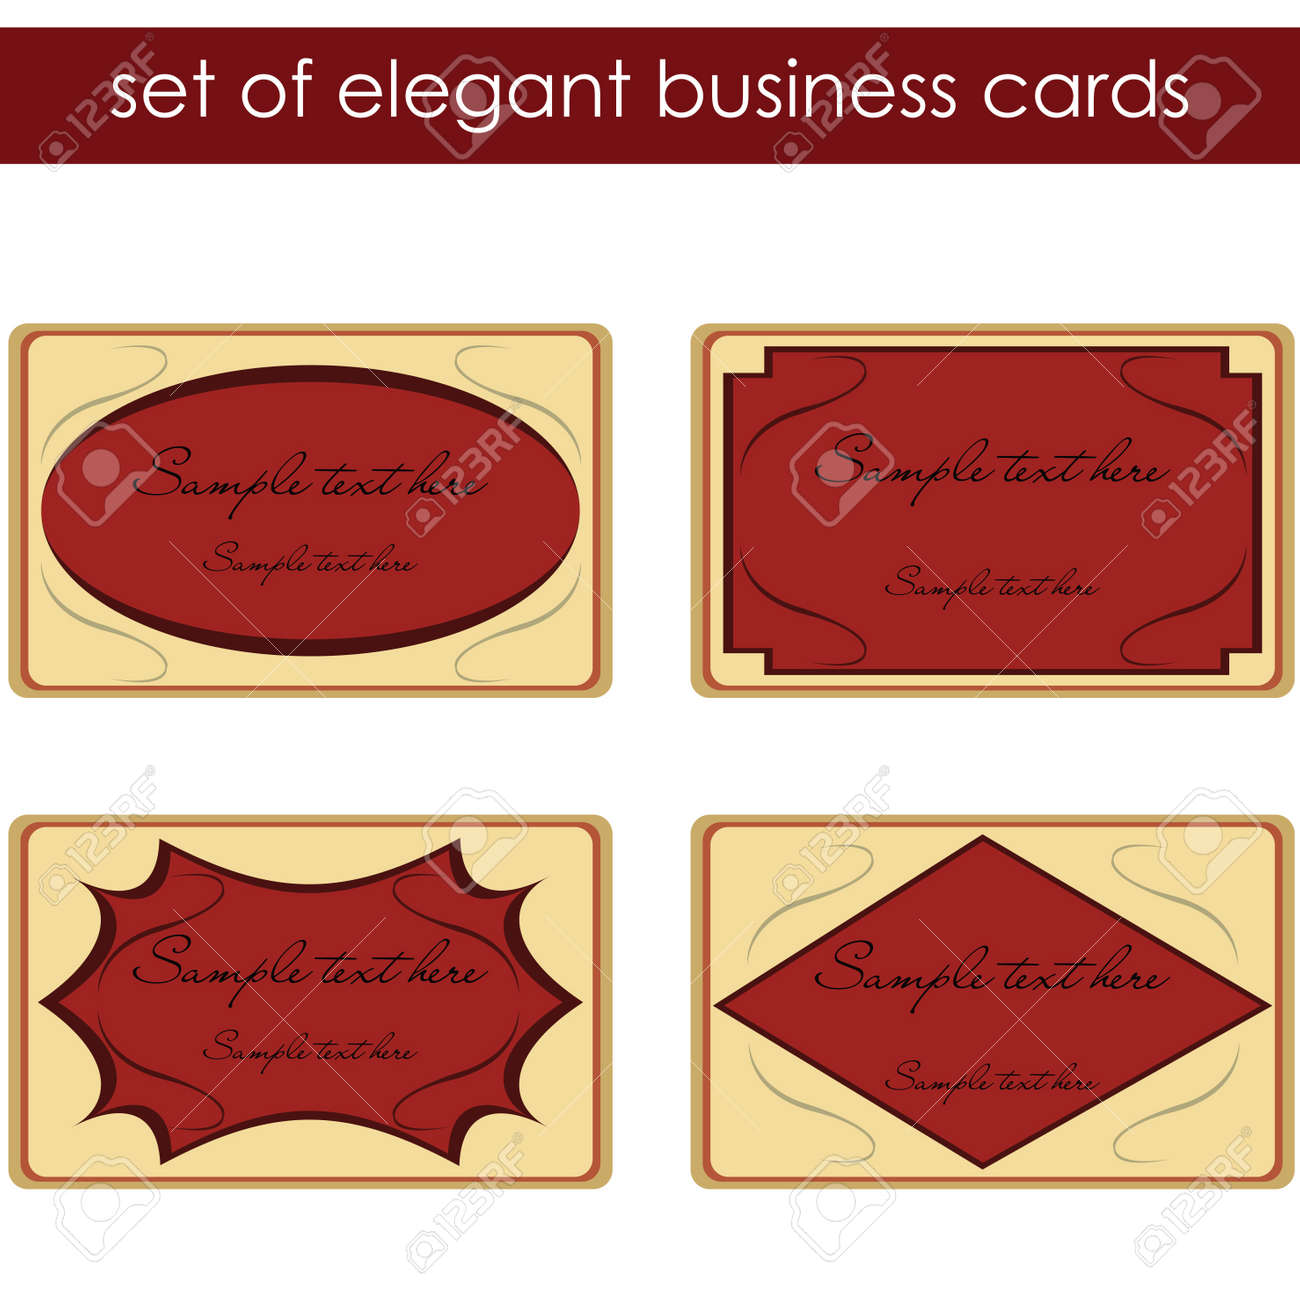 Elegant business cards, labels Stock Photo - 7032270